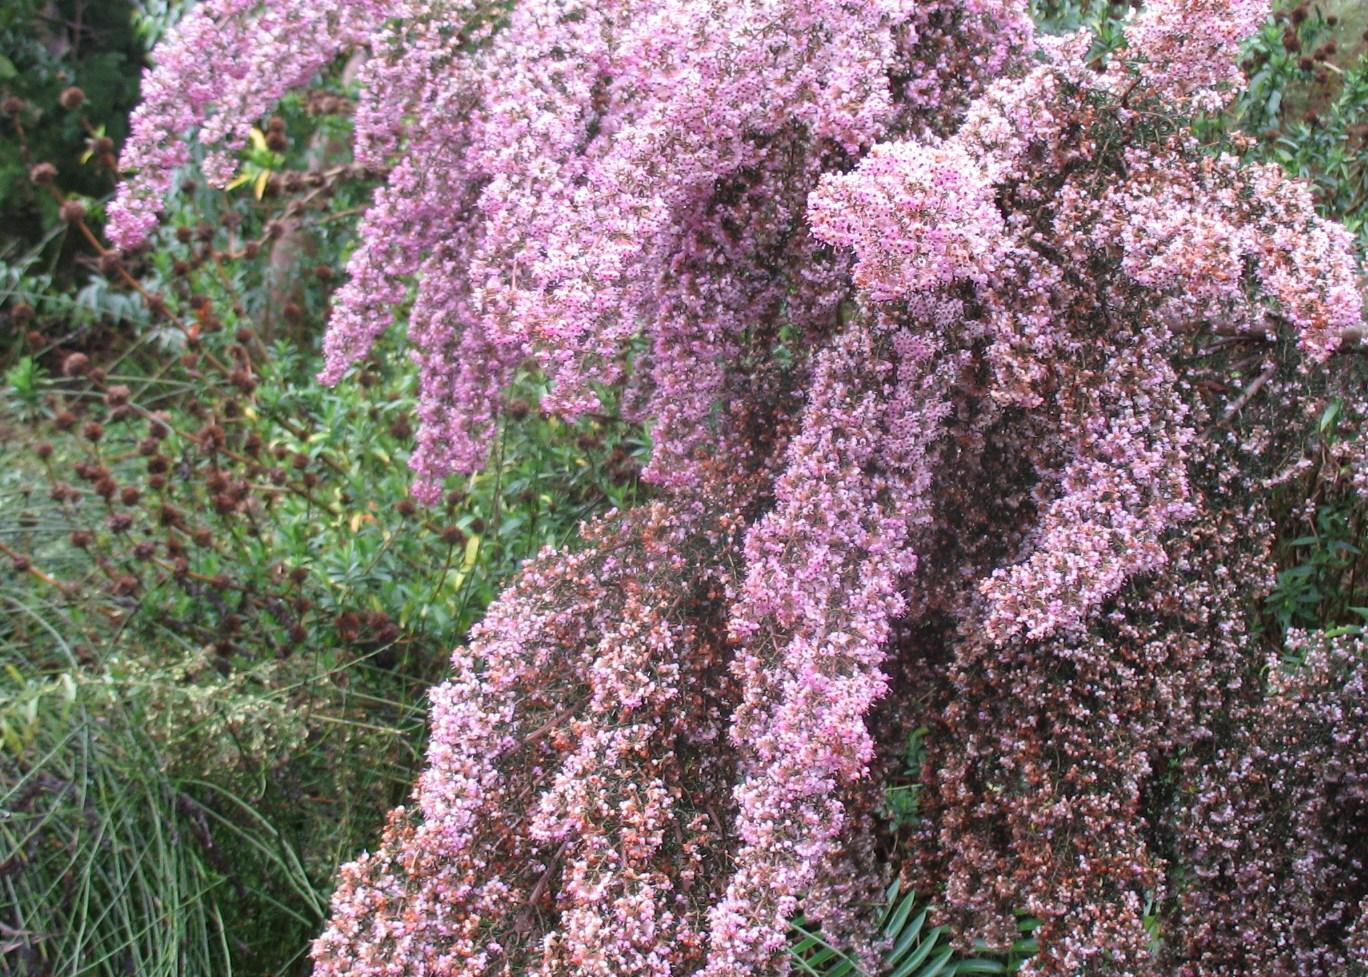 Erica canaliculata 'Rosea' / Erica canaliculata 'Rosea'